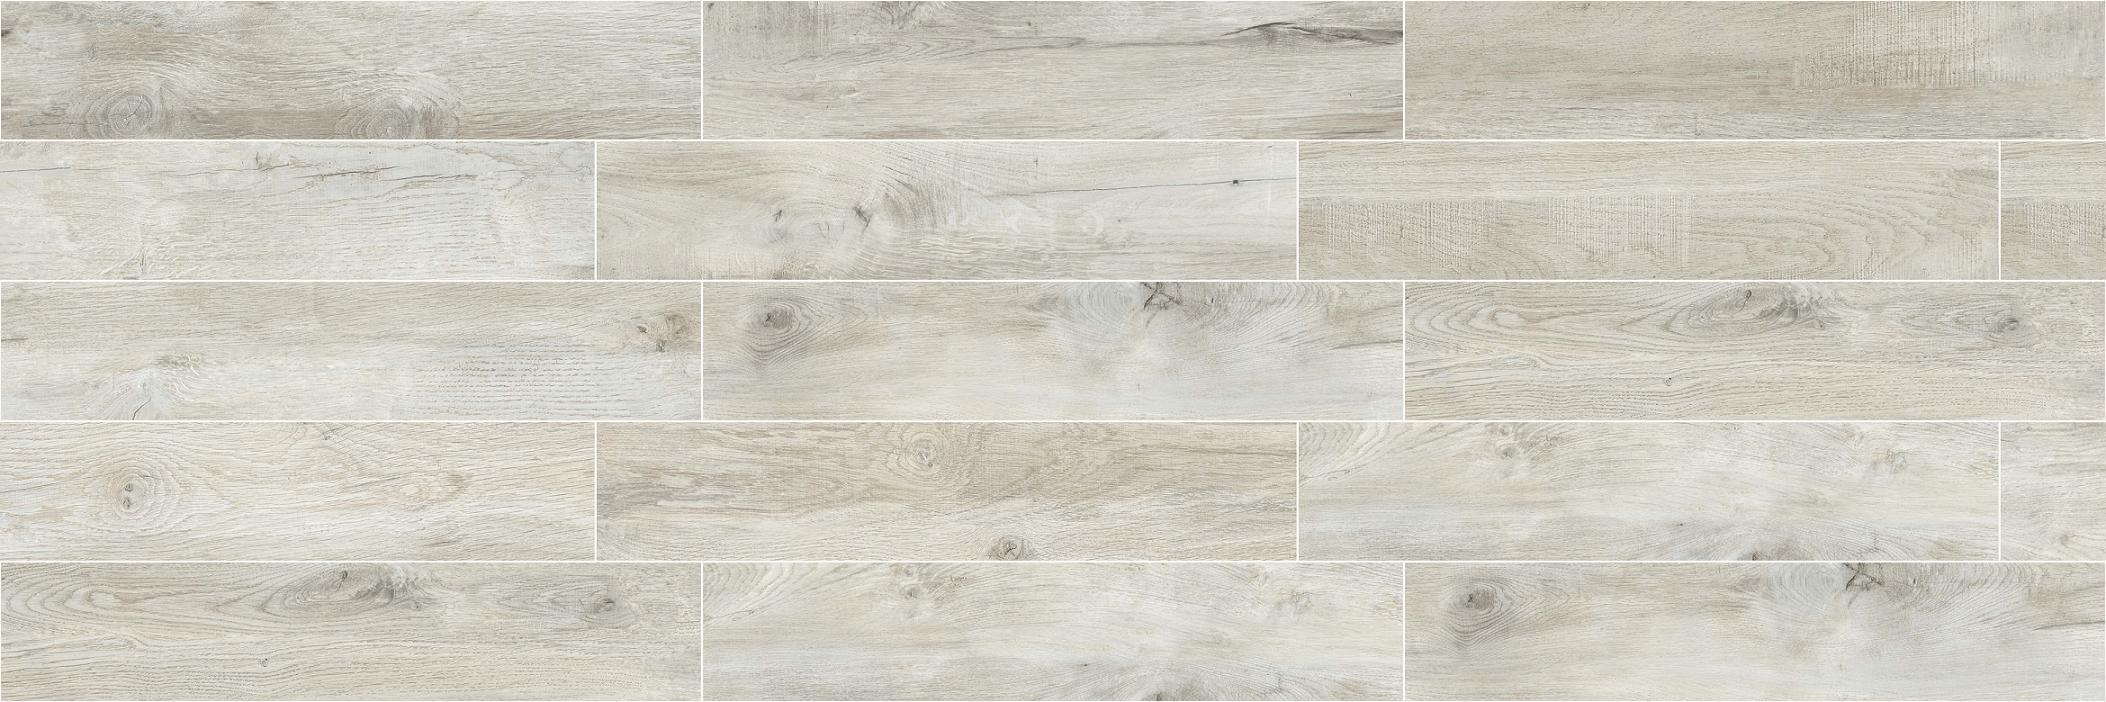 High Quality Building Material Porcelain Wood Tile Floor Tile Lnc2012020 Yellow/Grey